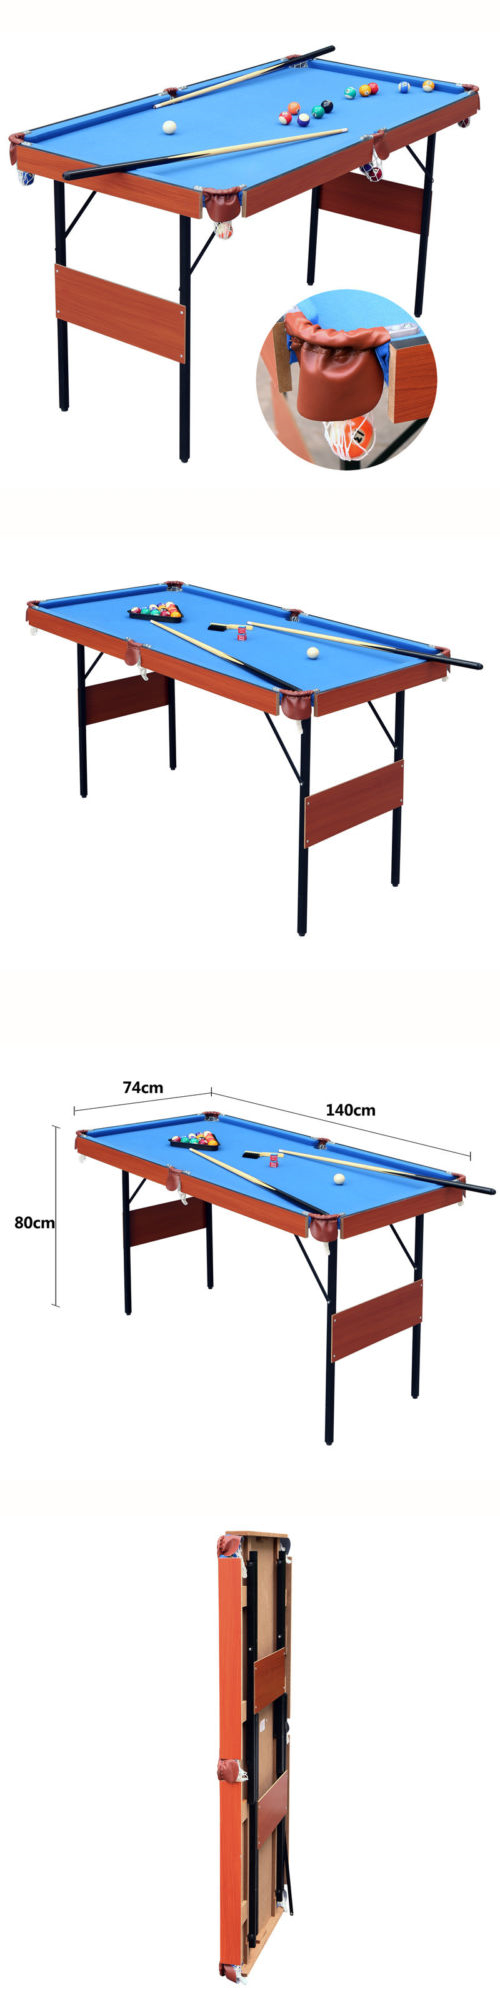 Tables 21213: 55 Billiards Pool Table Top Folding Game Room Balls Cues  Board Billiards Set